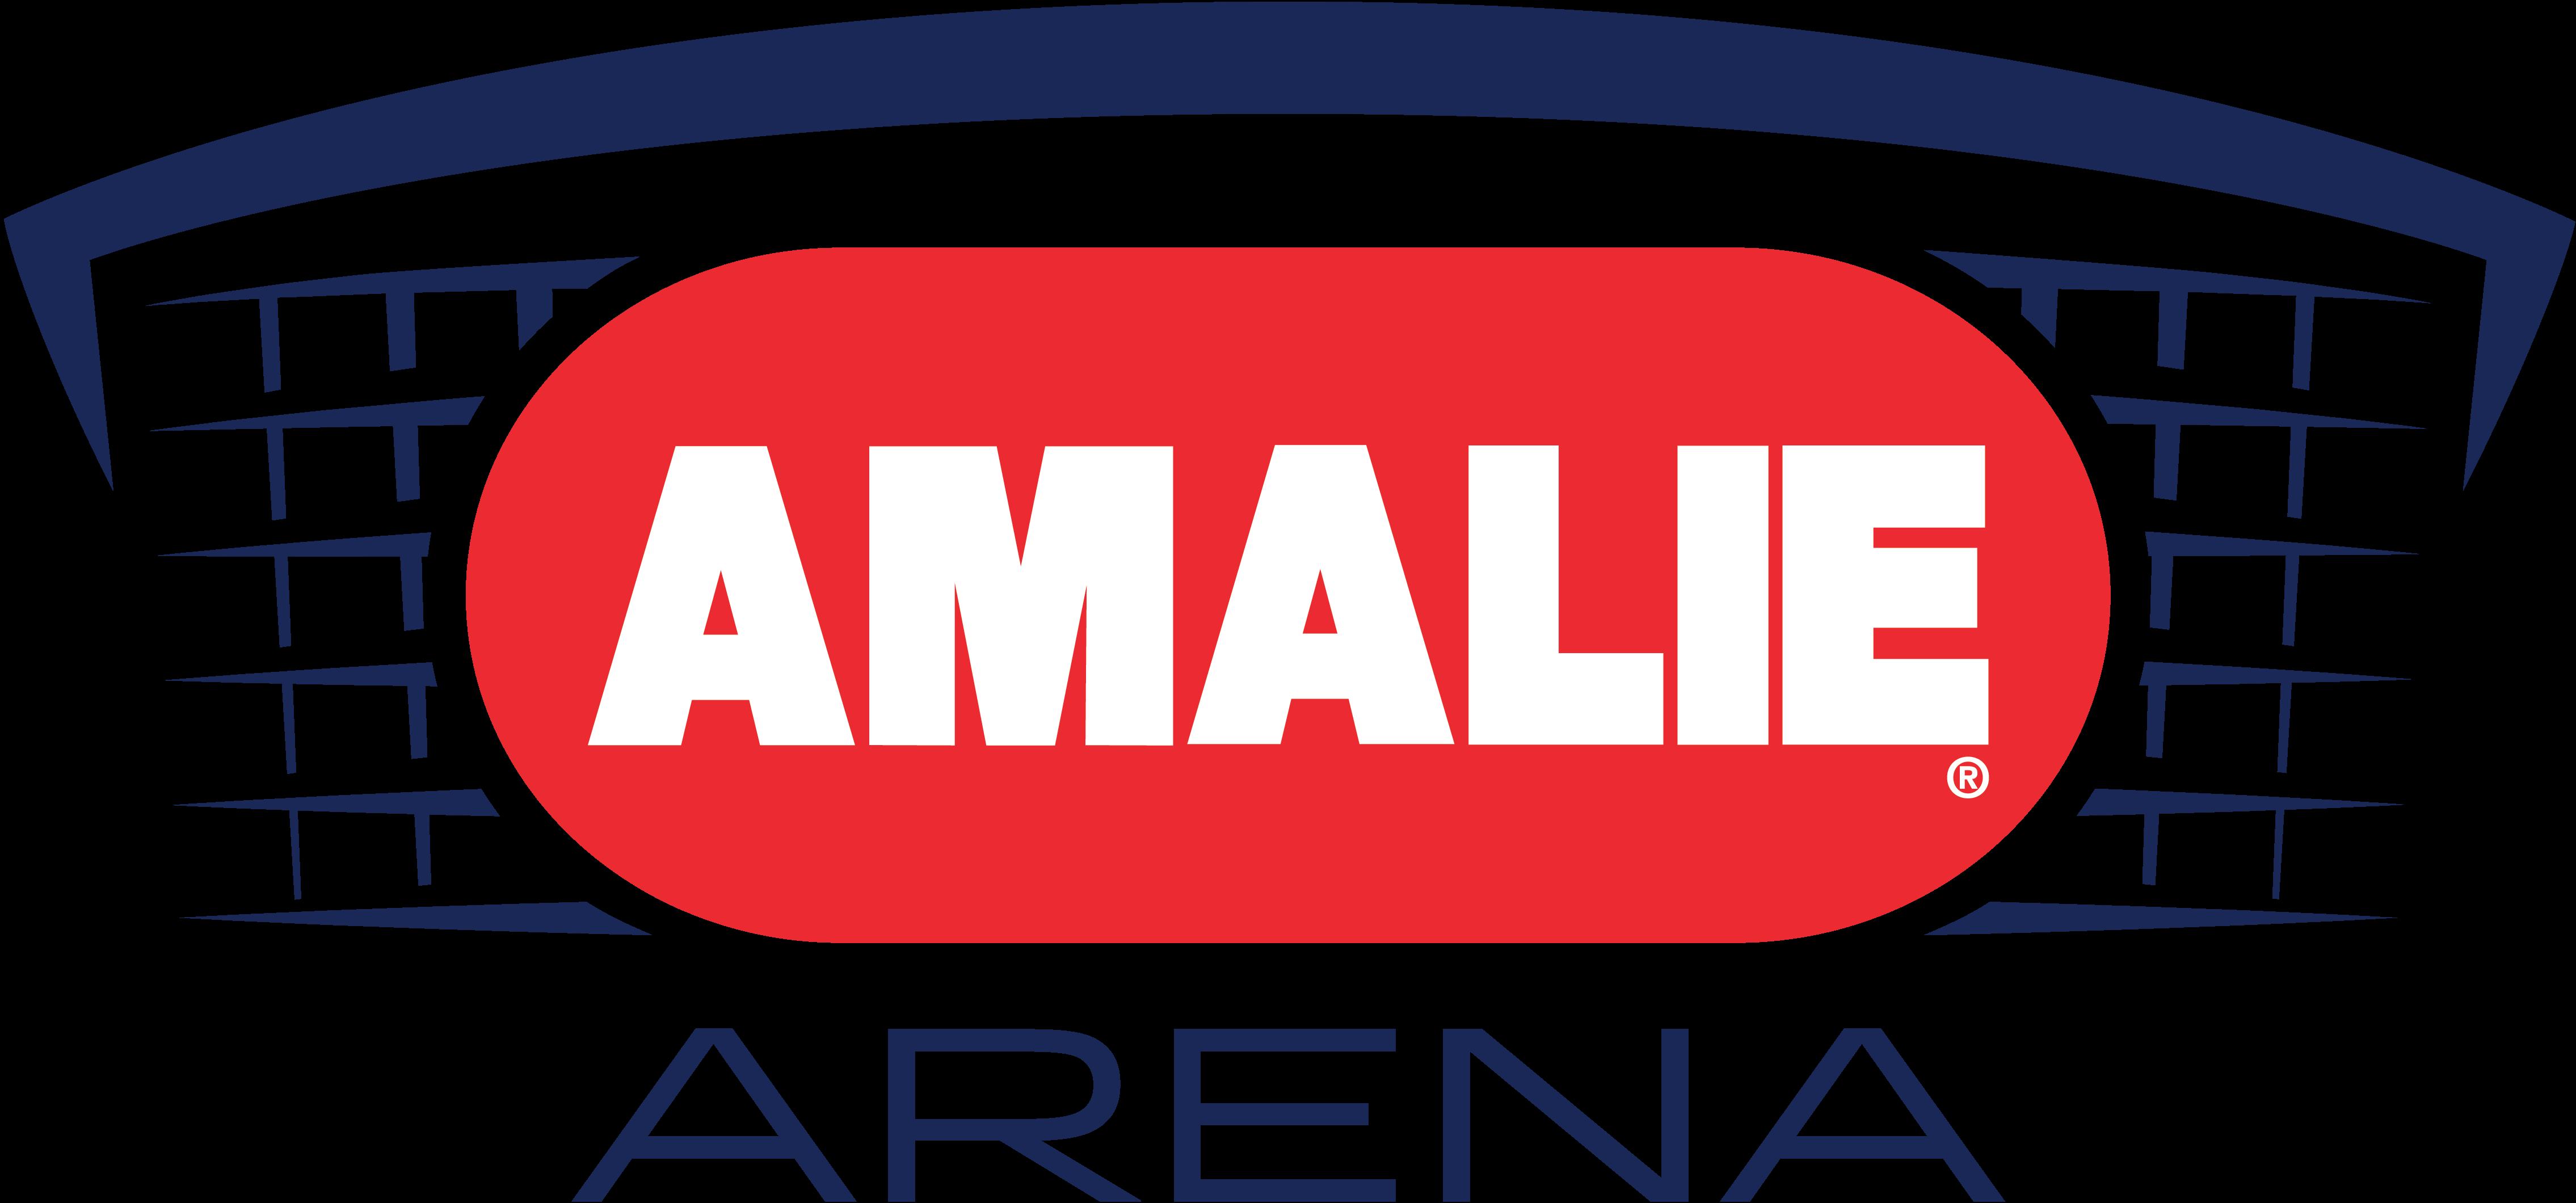 Amalie Arena